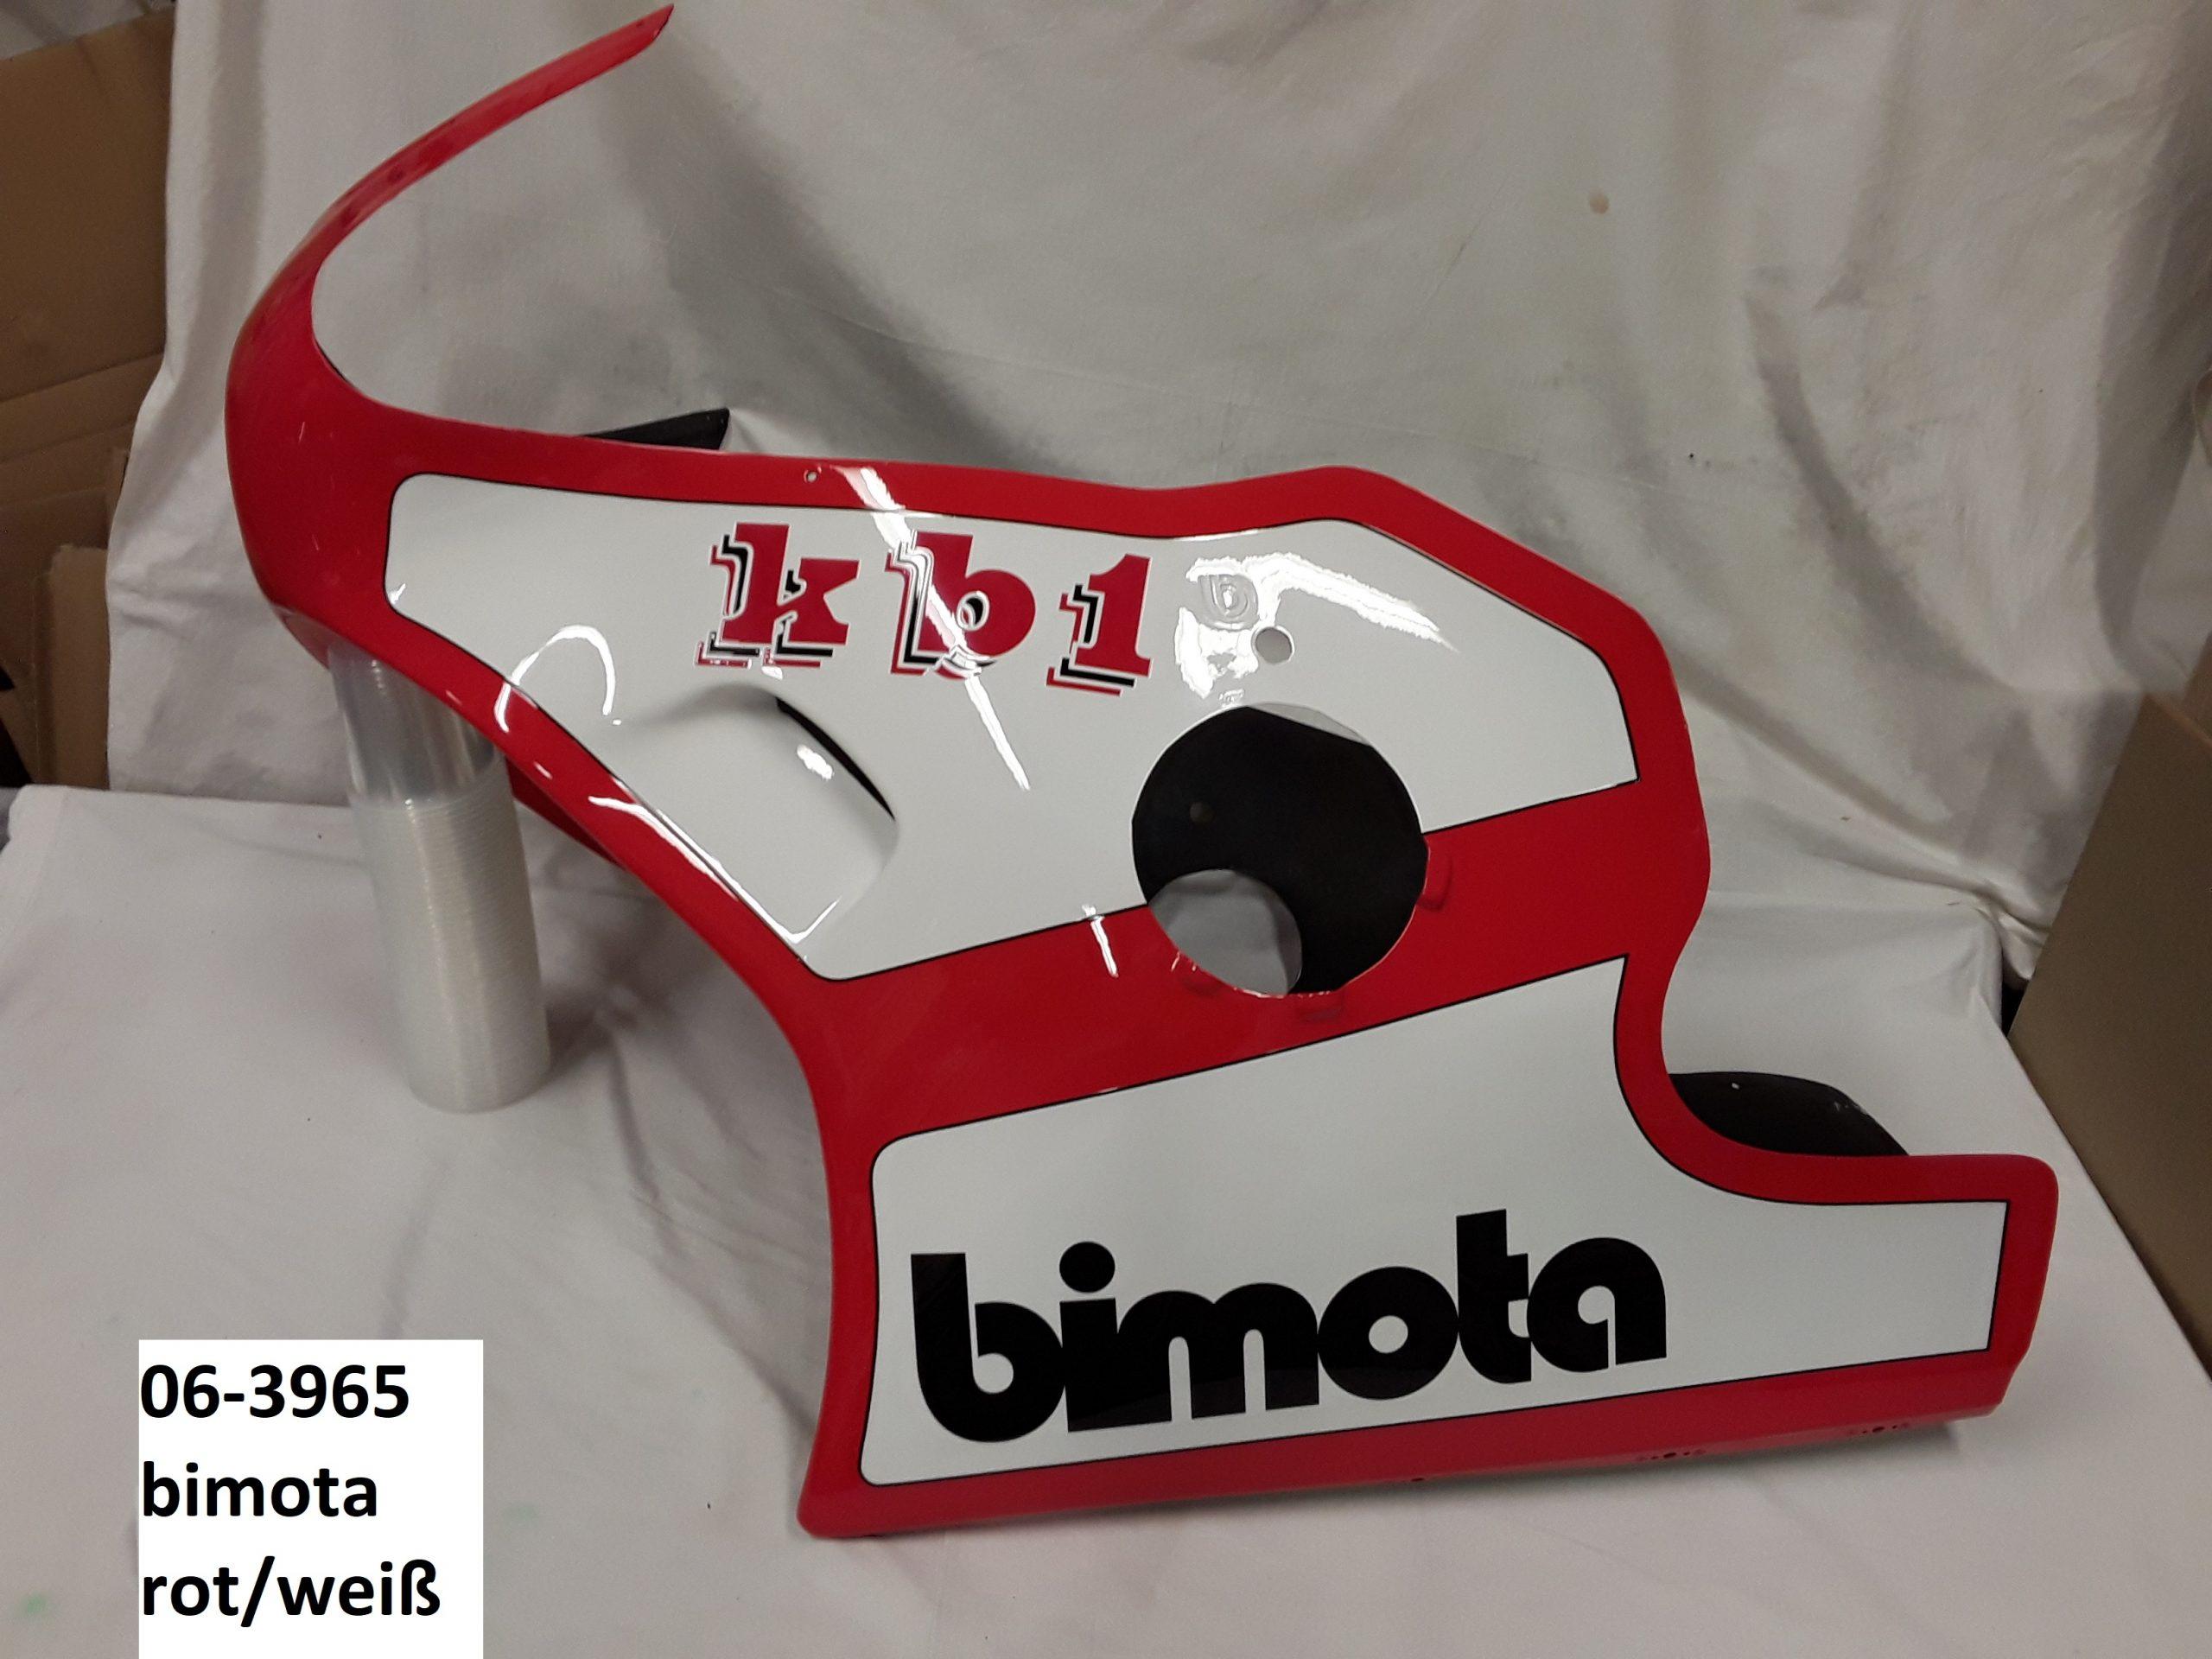 Bimota rot/weiß RH-Lacke Lackiererei Motorradlackierung 06-3965-1